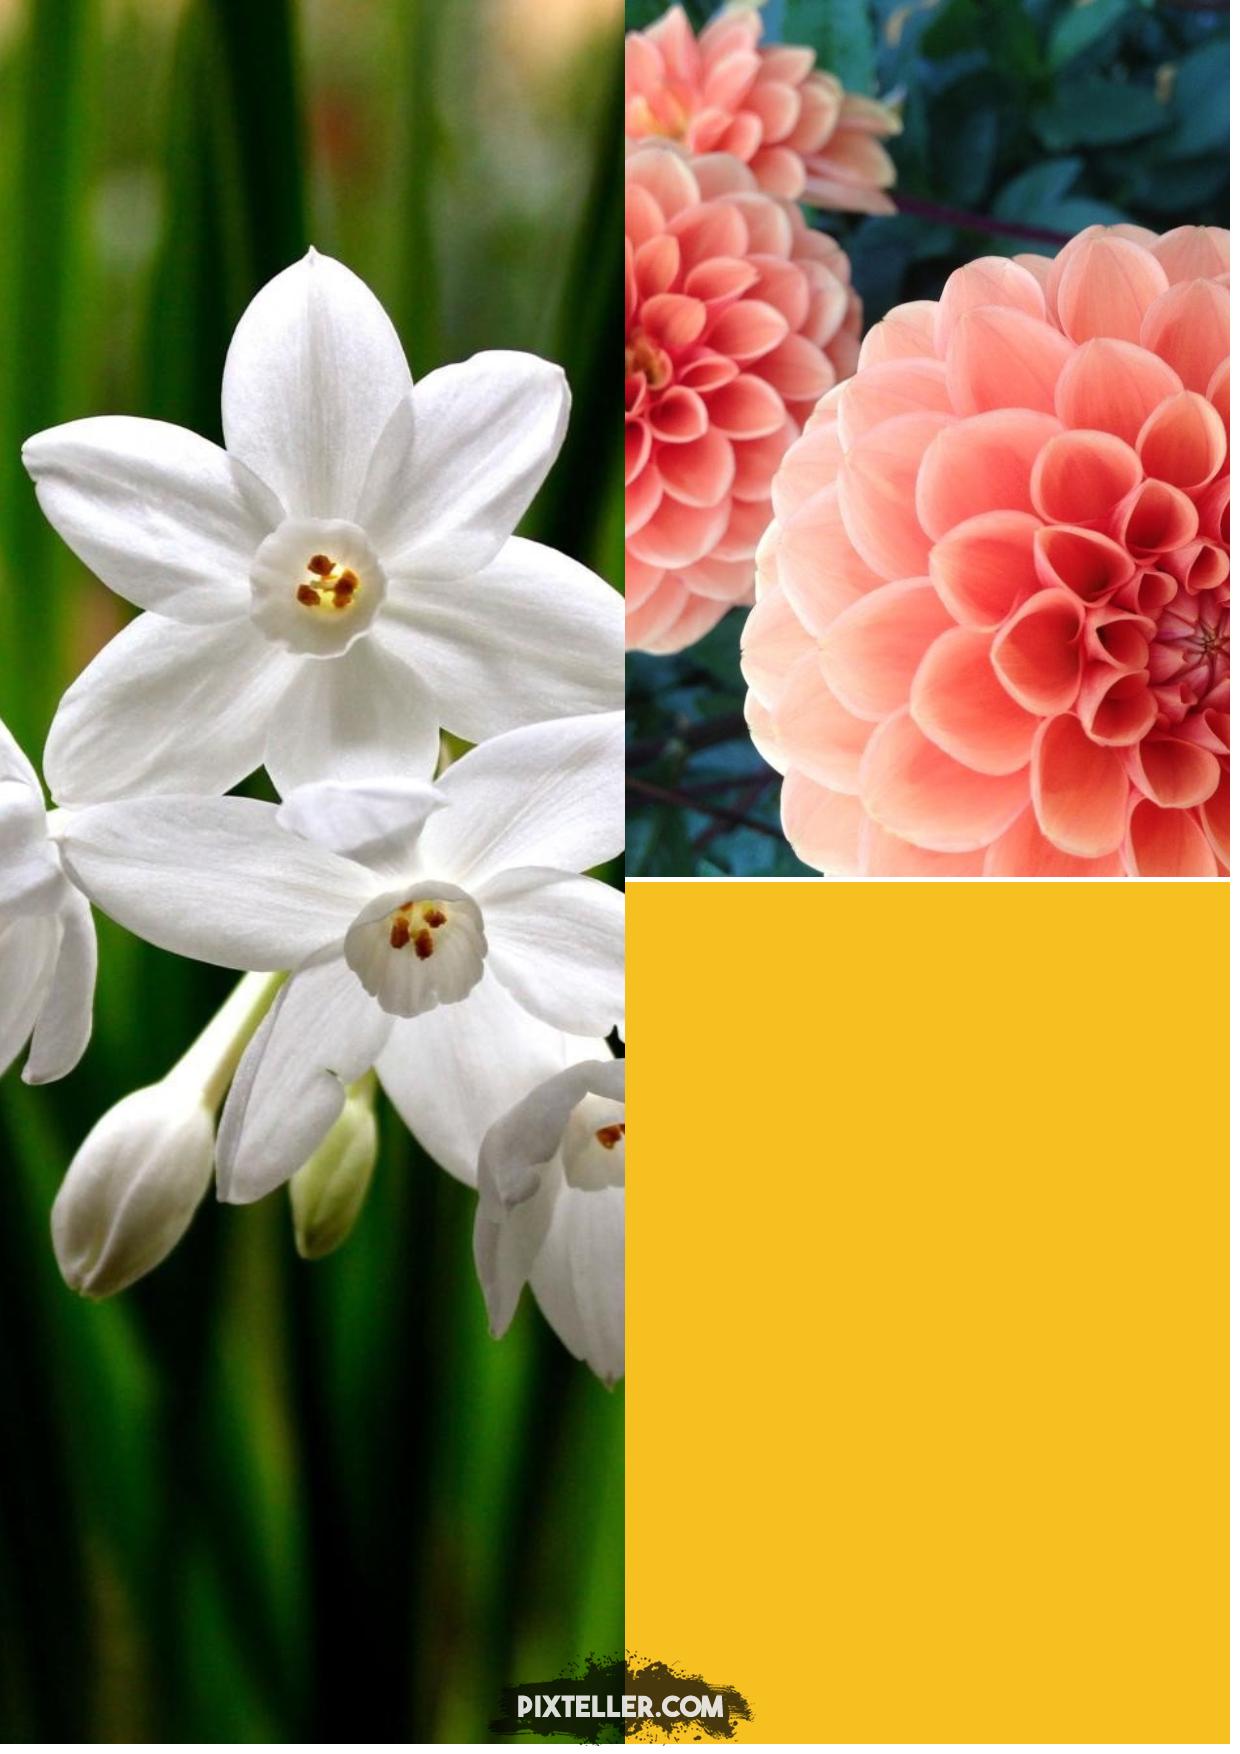 Collage,                Image,                Photos,                White,                Black,                Yellow,                 Free Image